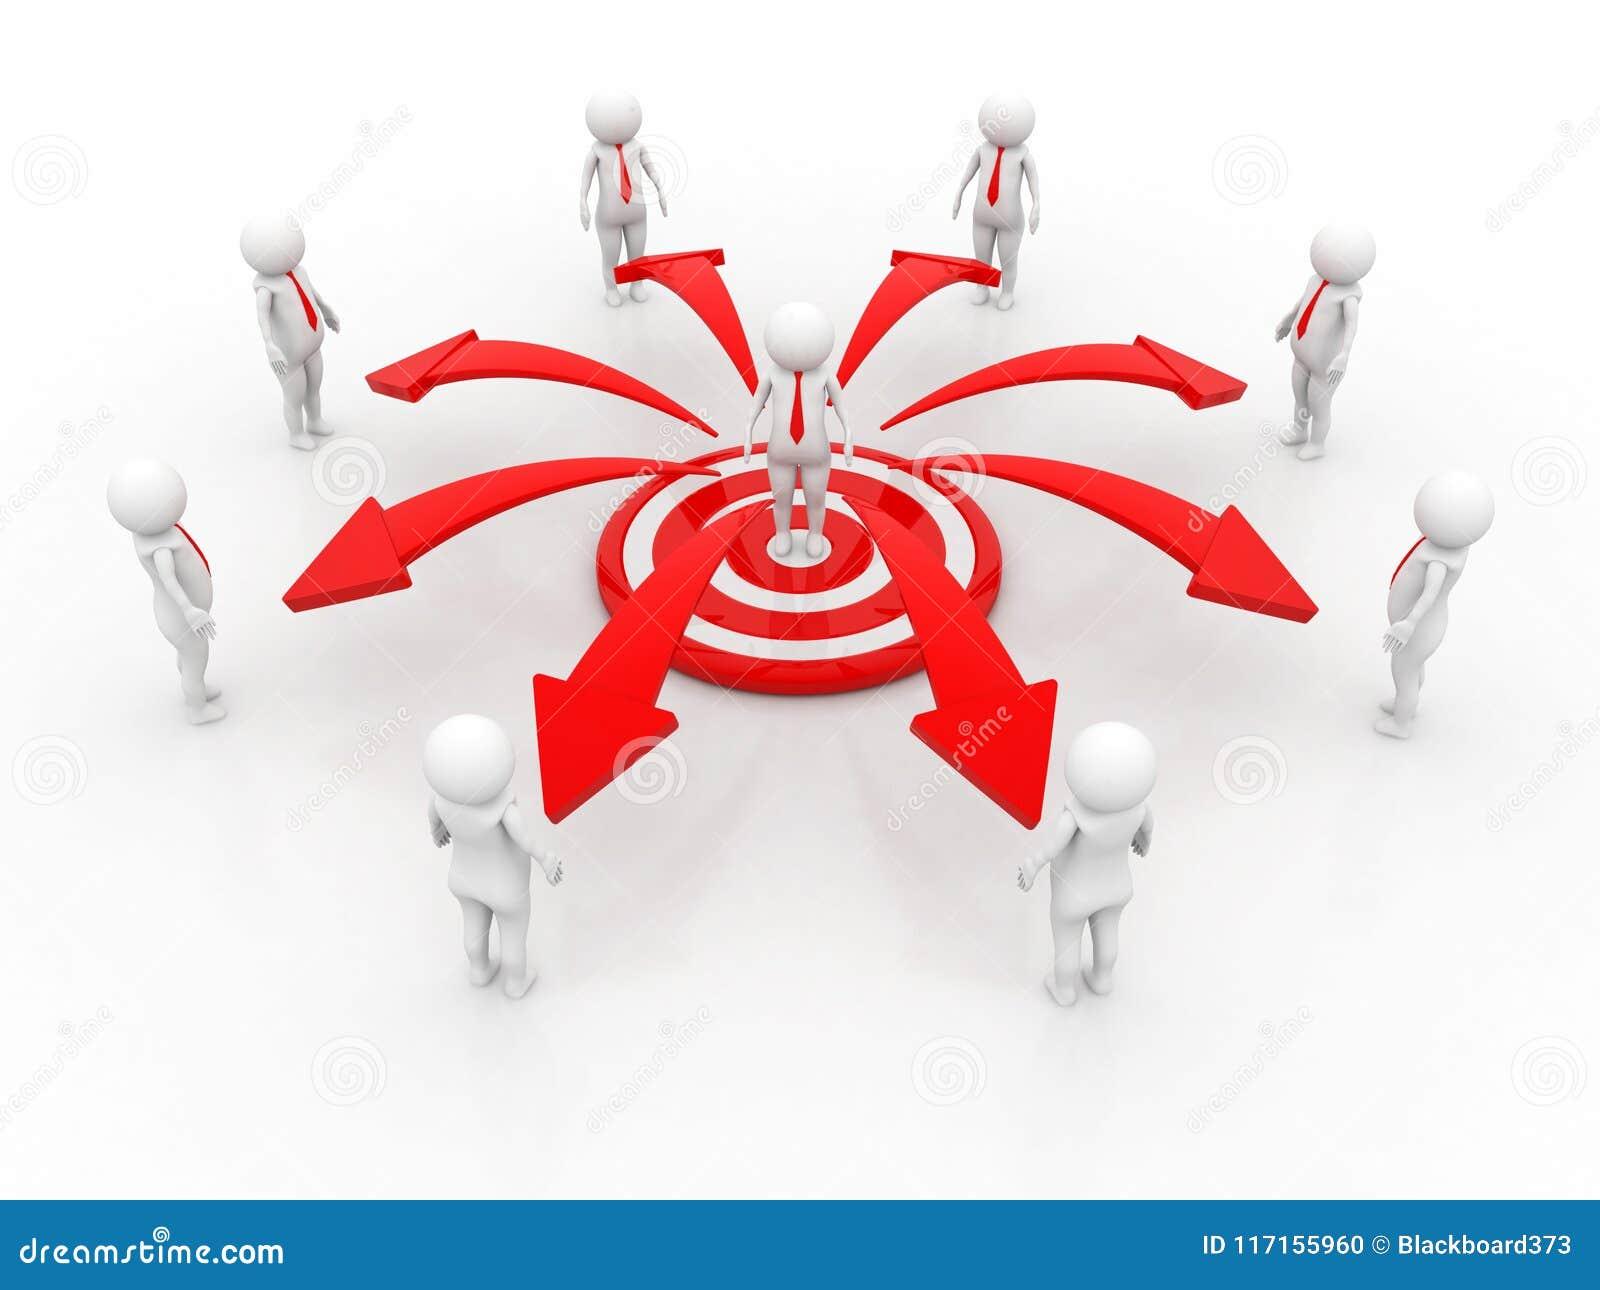 3d翻译企业网络概念,领导,事务领导